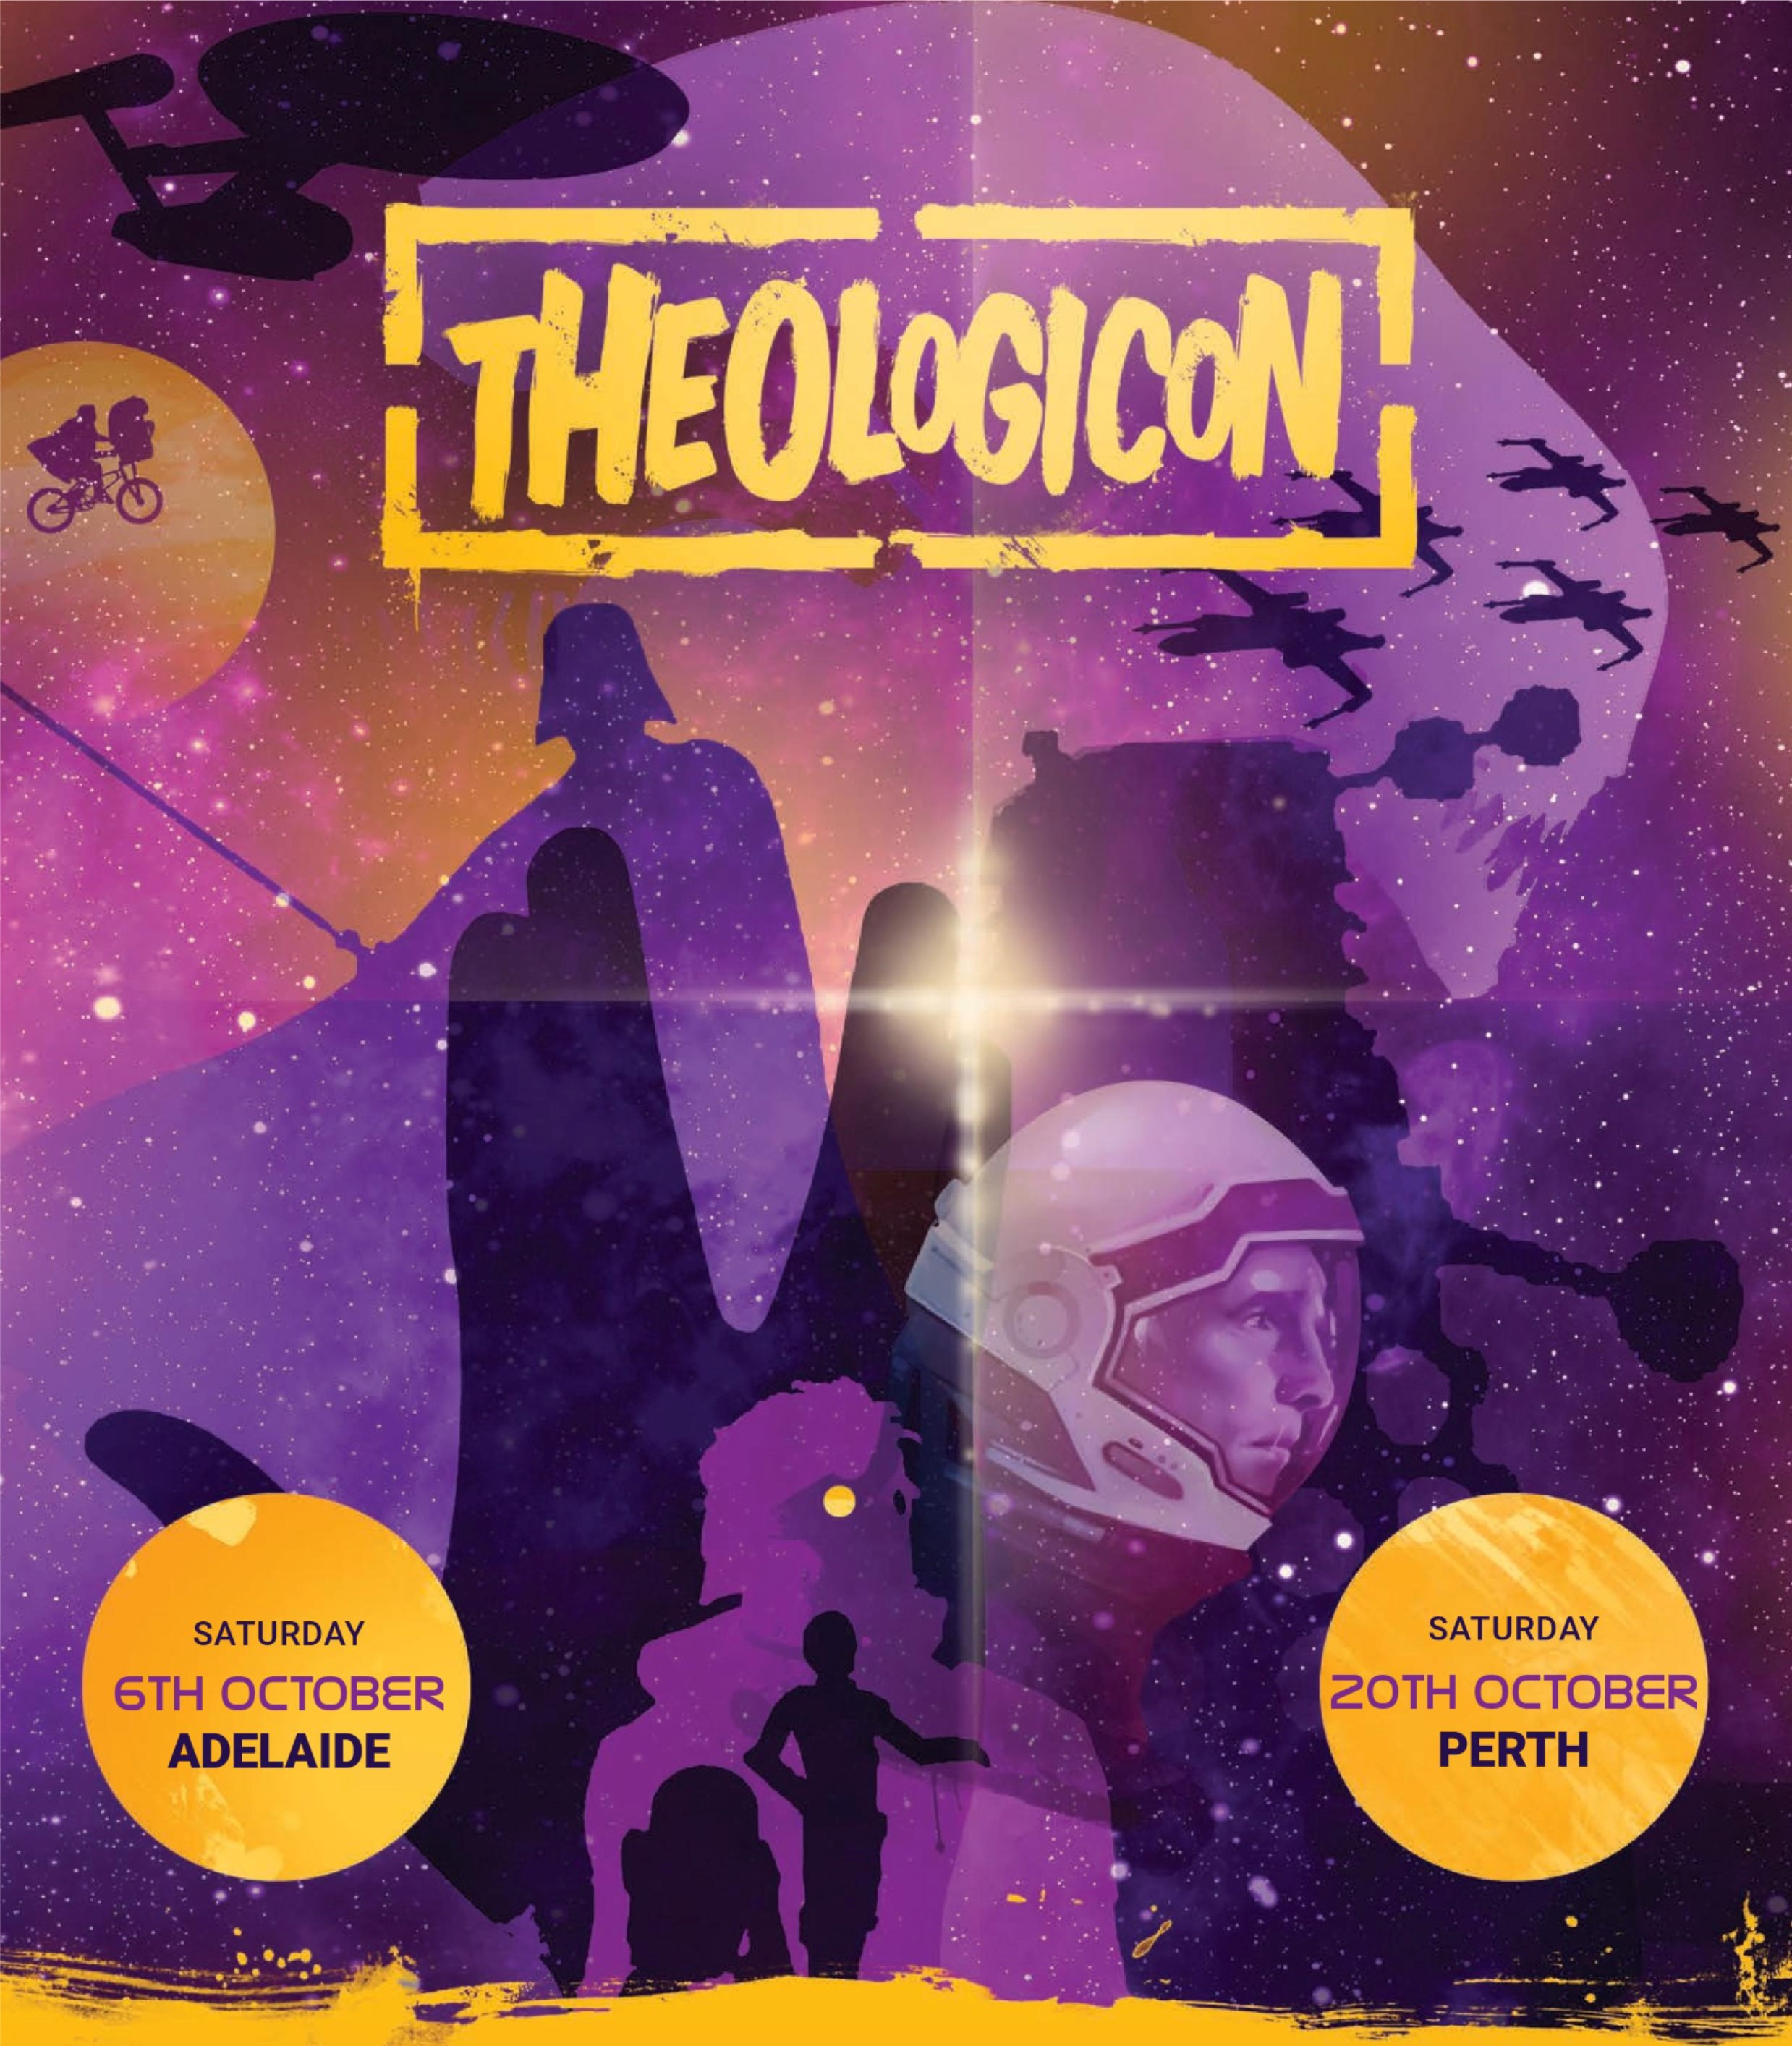 Theologicon